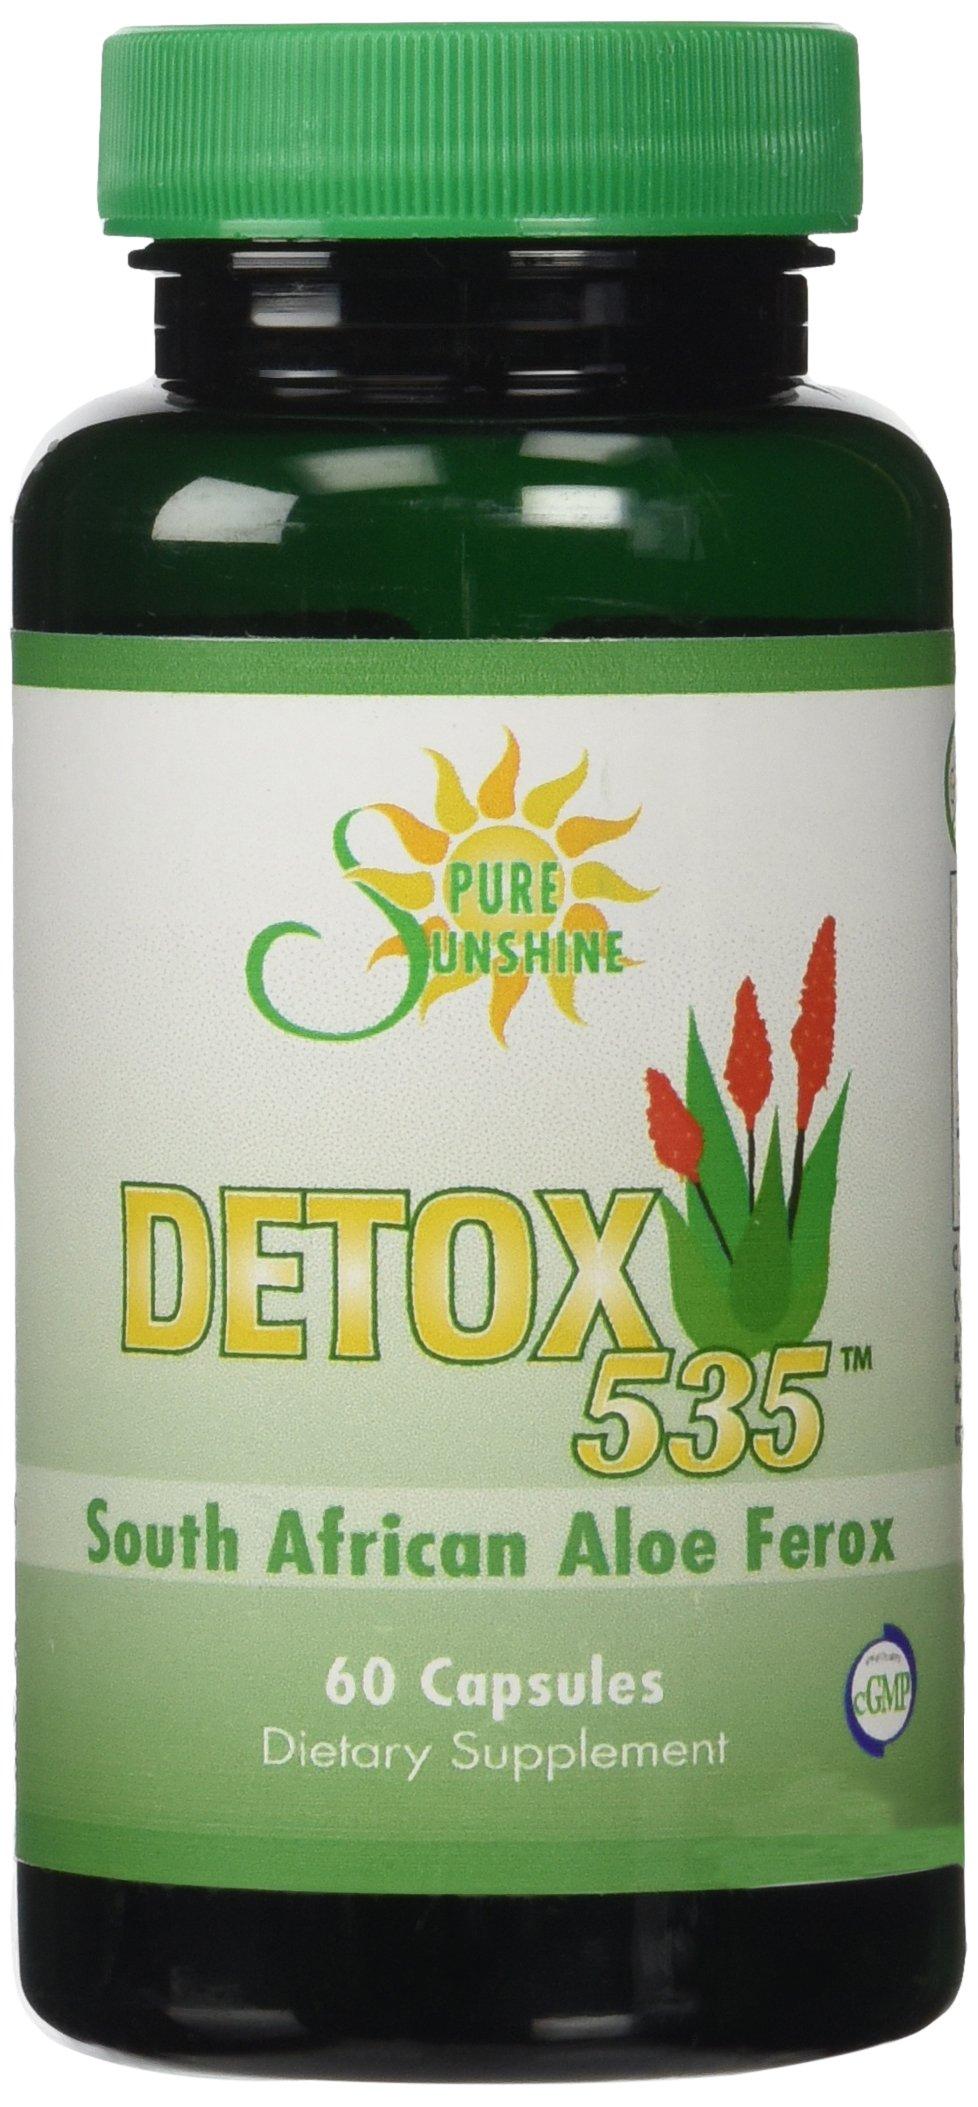 DETOX 535 South African Cape Aloe Ferox Pills- Natural Laxative